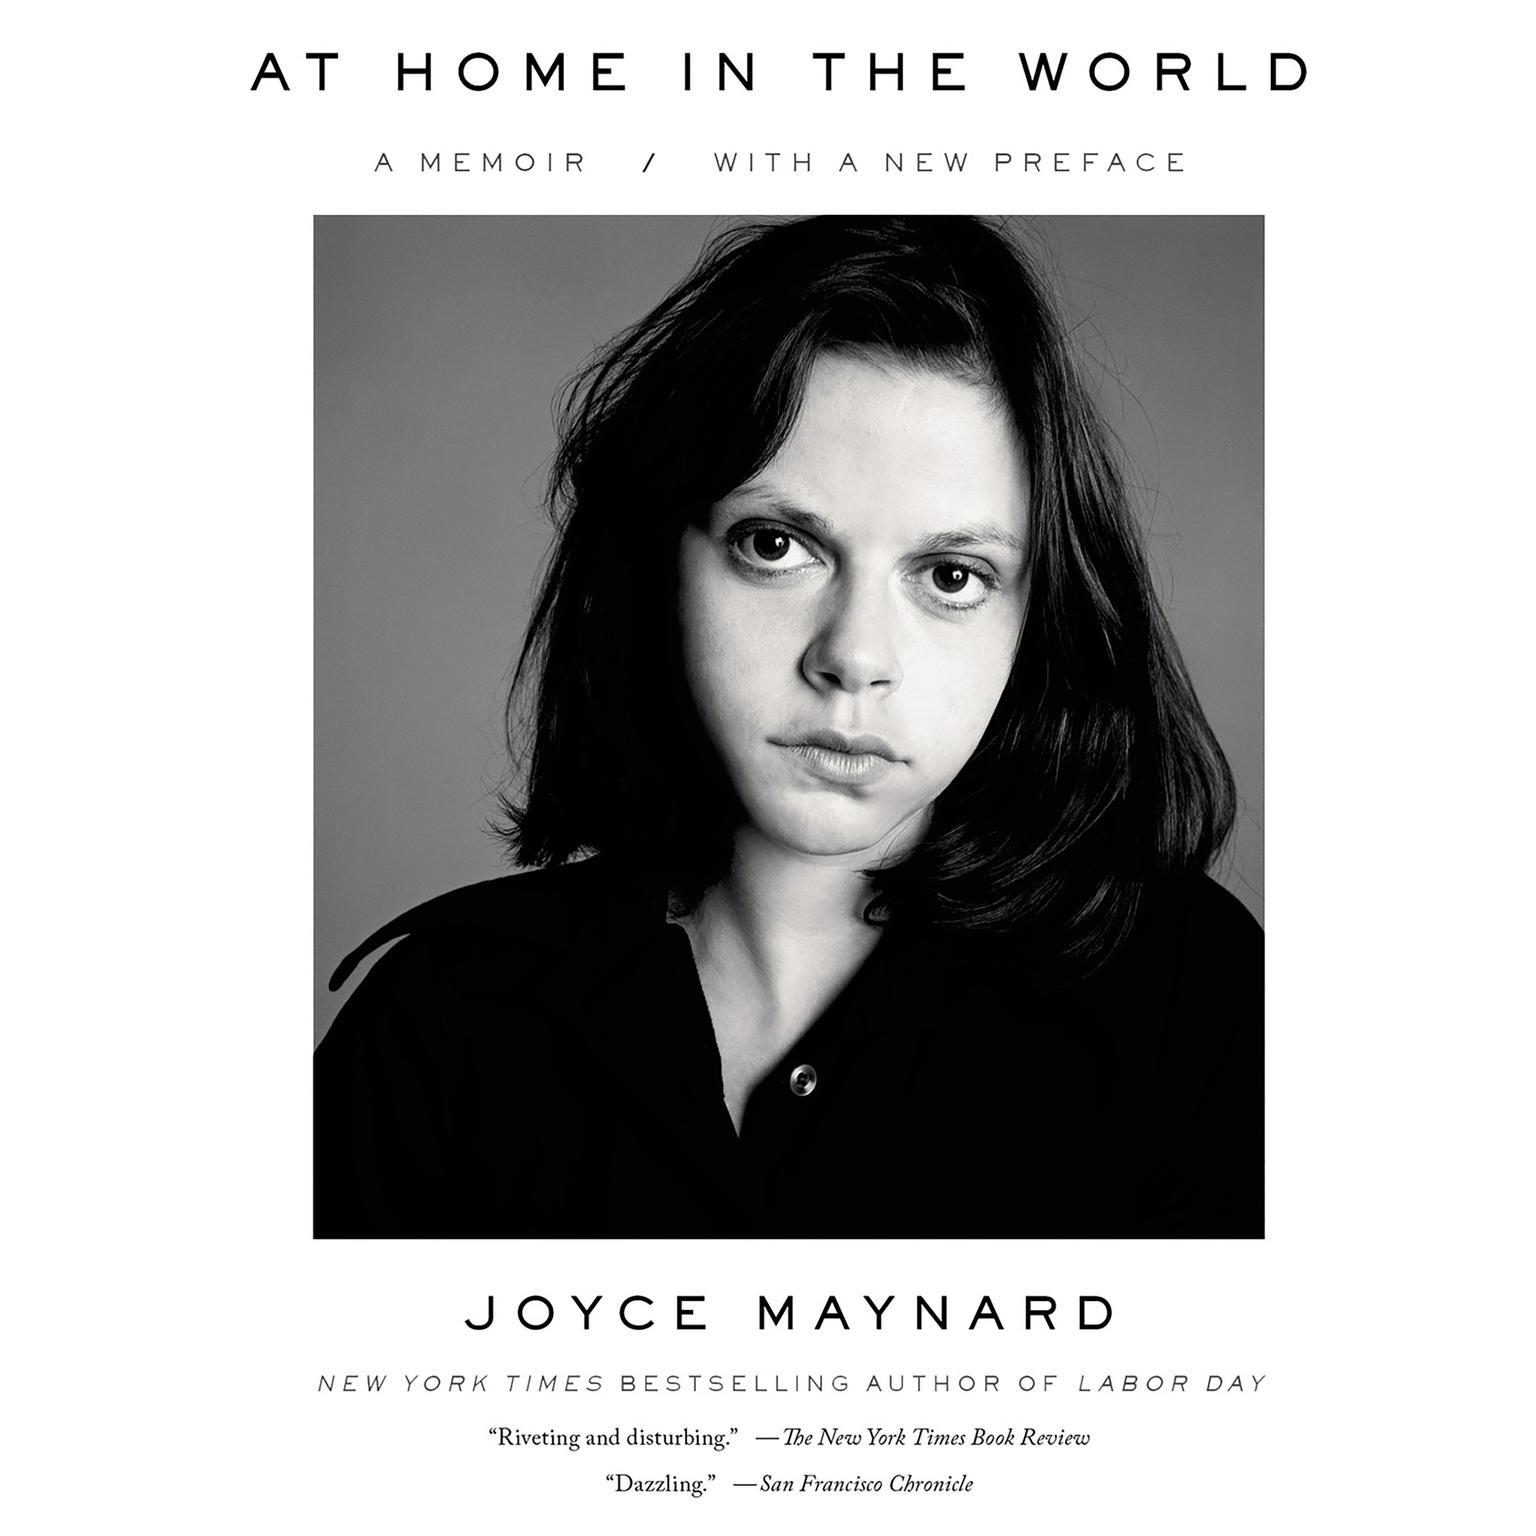 Variety Of Clerk Resume Examples Best Sample Resume Download At Home In The World Audiobook By Joyce Maynard